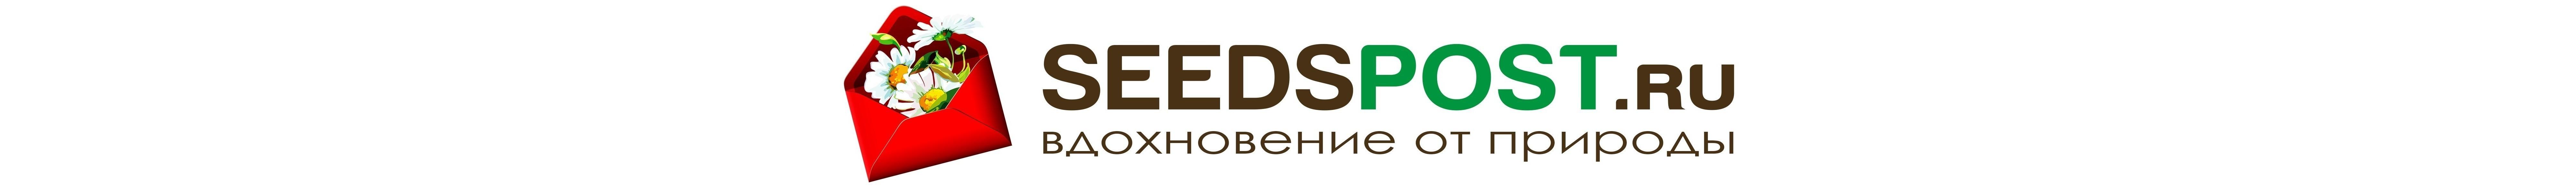 Seedspost